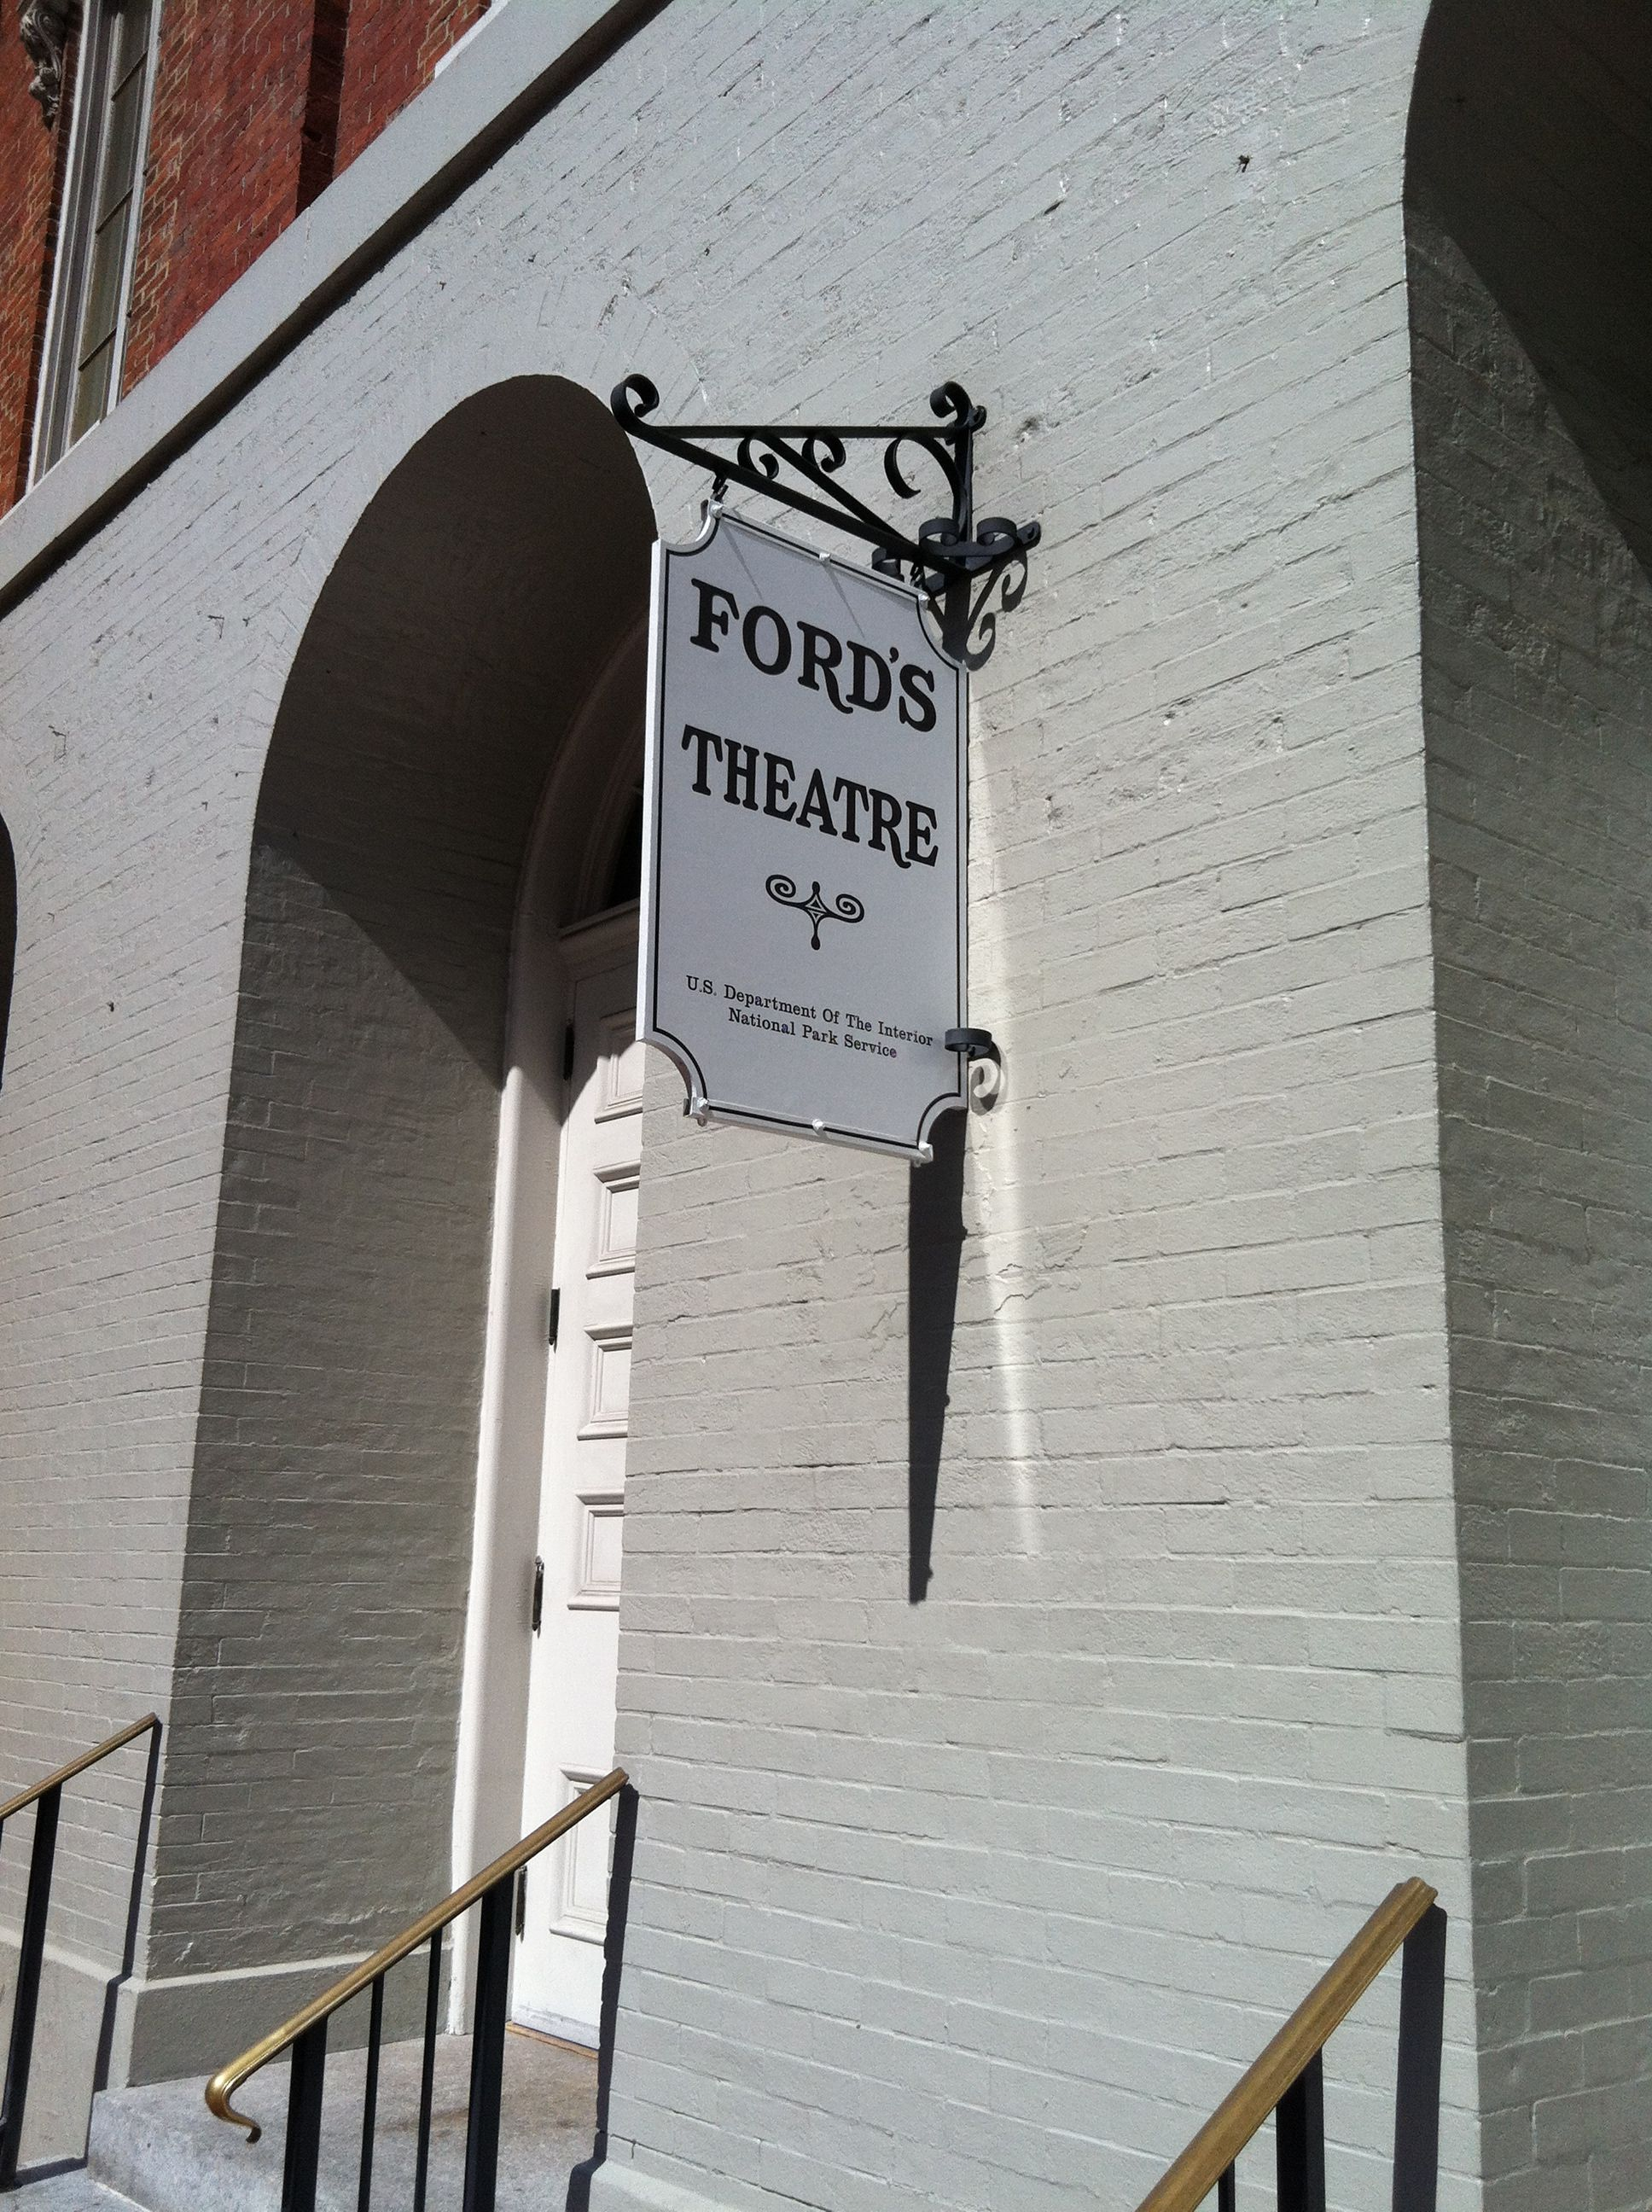 Ford's Theatre. Washington DC. Such a historic place in the Washington Metropolitan Area.